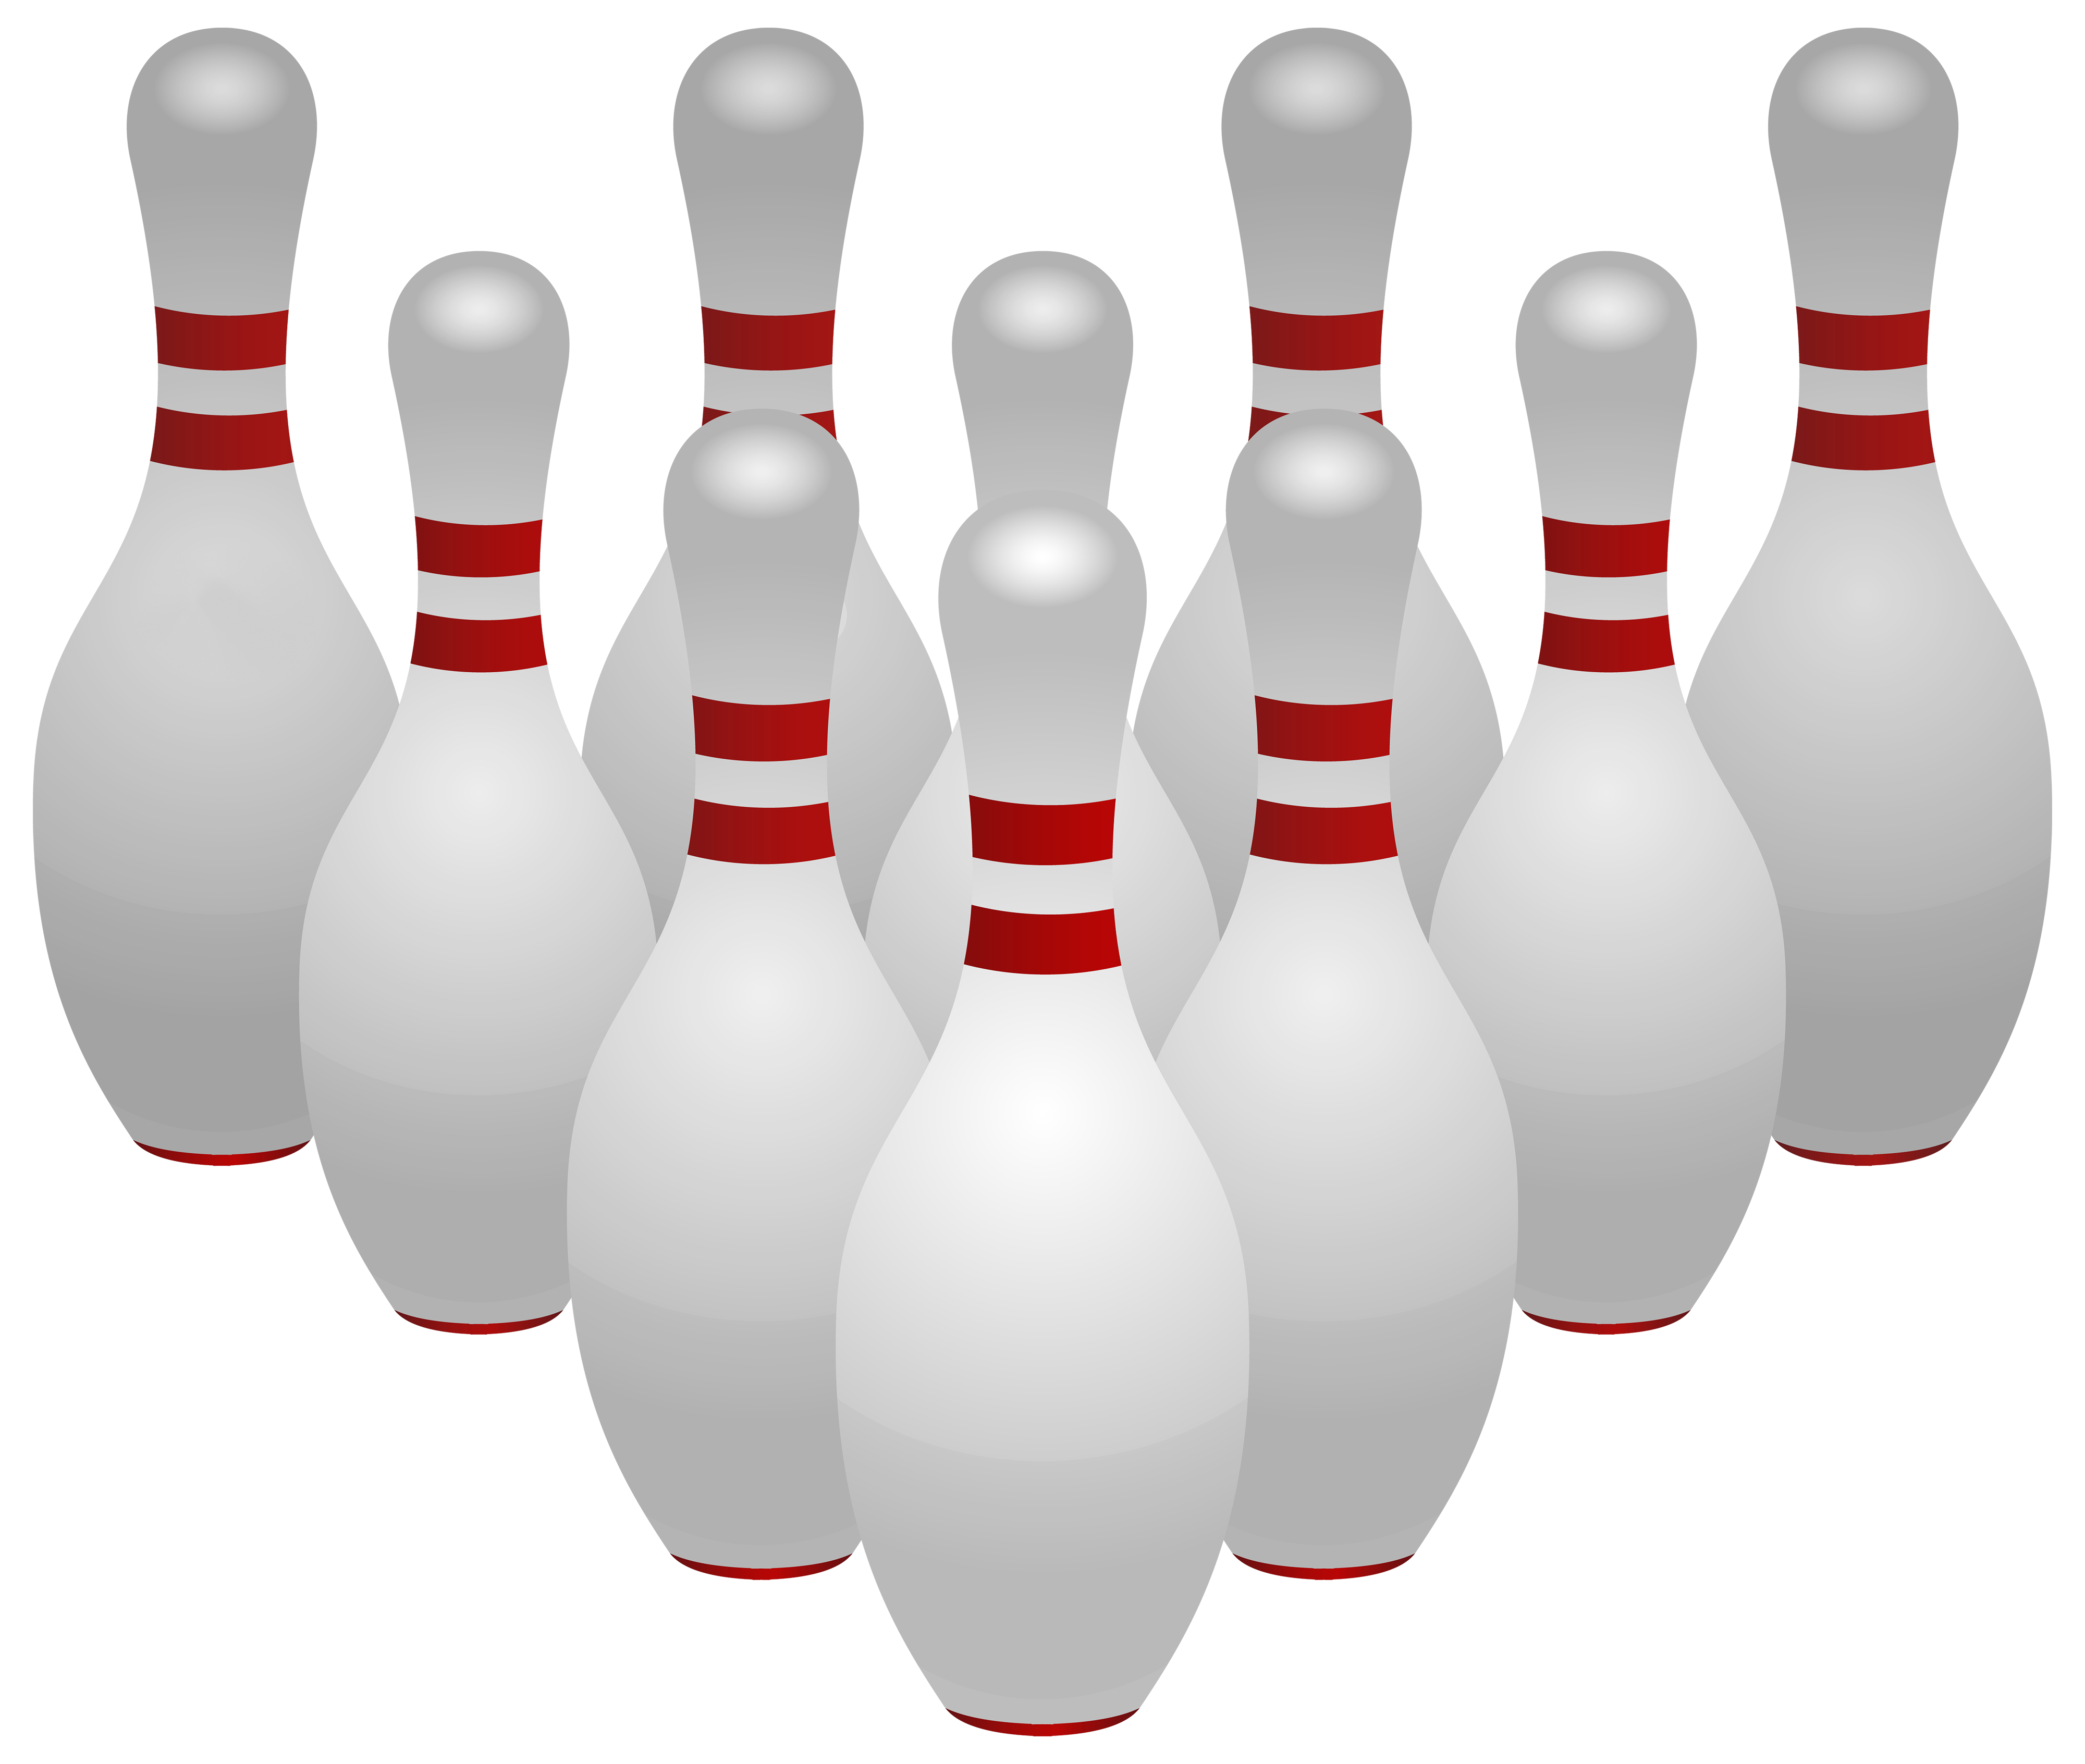 Bowling HD PNG - 94943